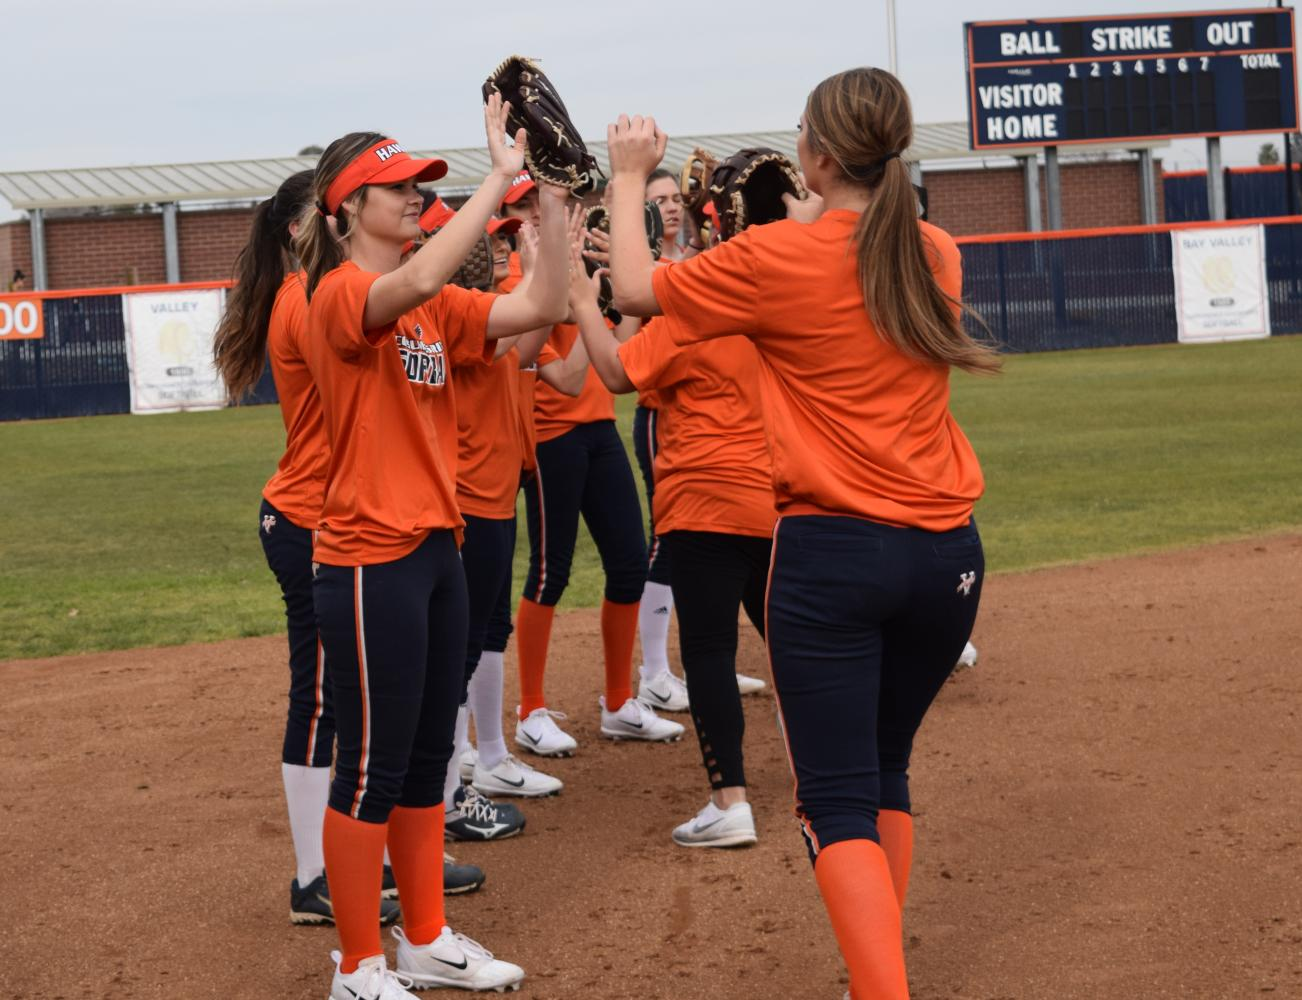 Softball bonds during practice before the season begins